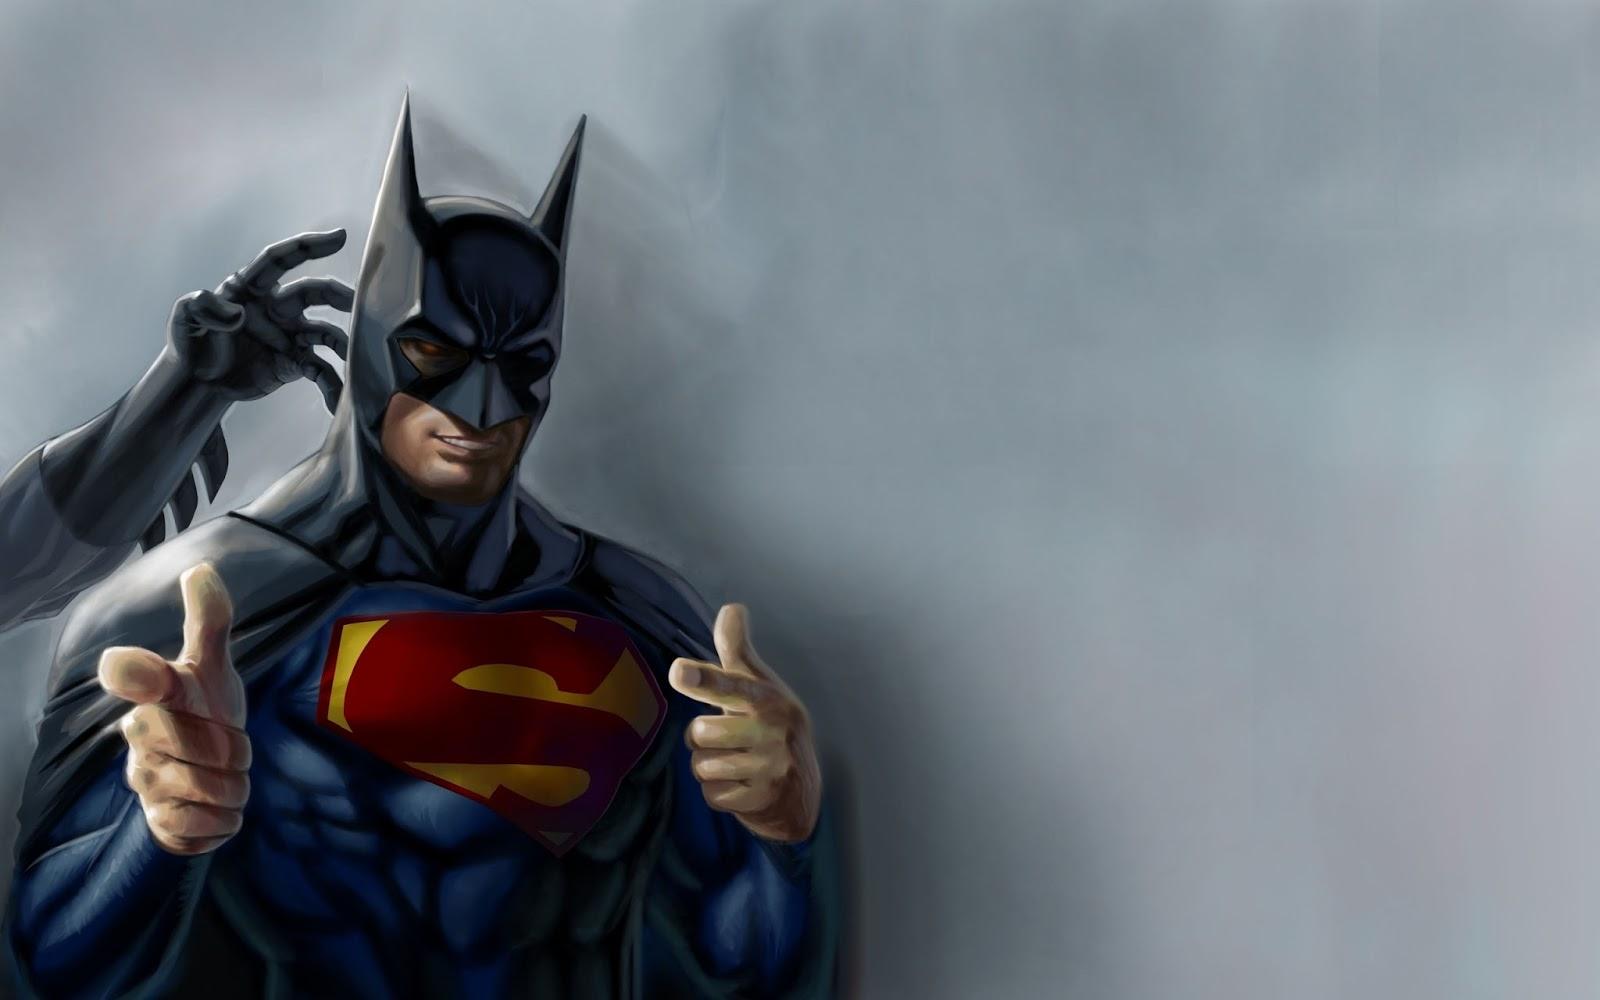 Superman Batman DC Comic Heroes Superhero Funny Parody HD Wallpaper i3 1600x1000